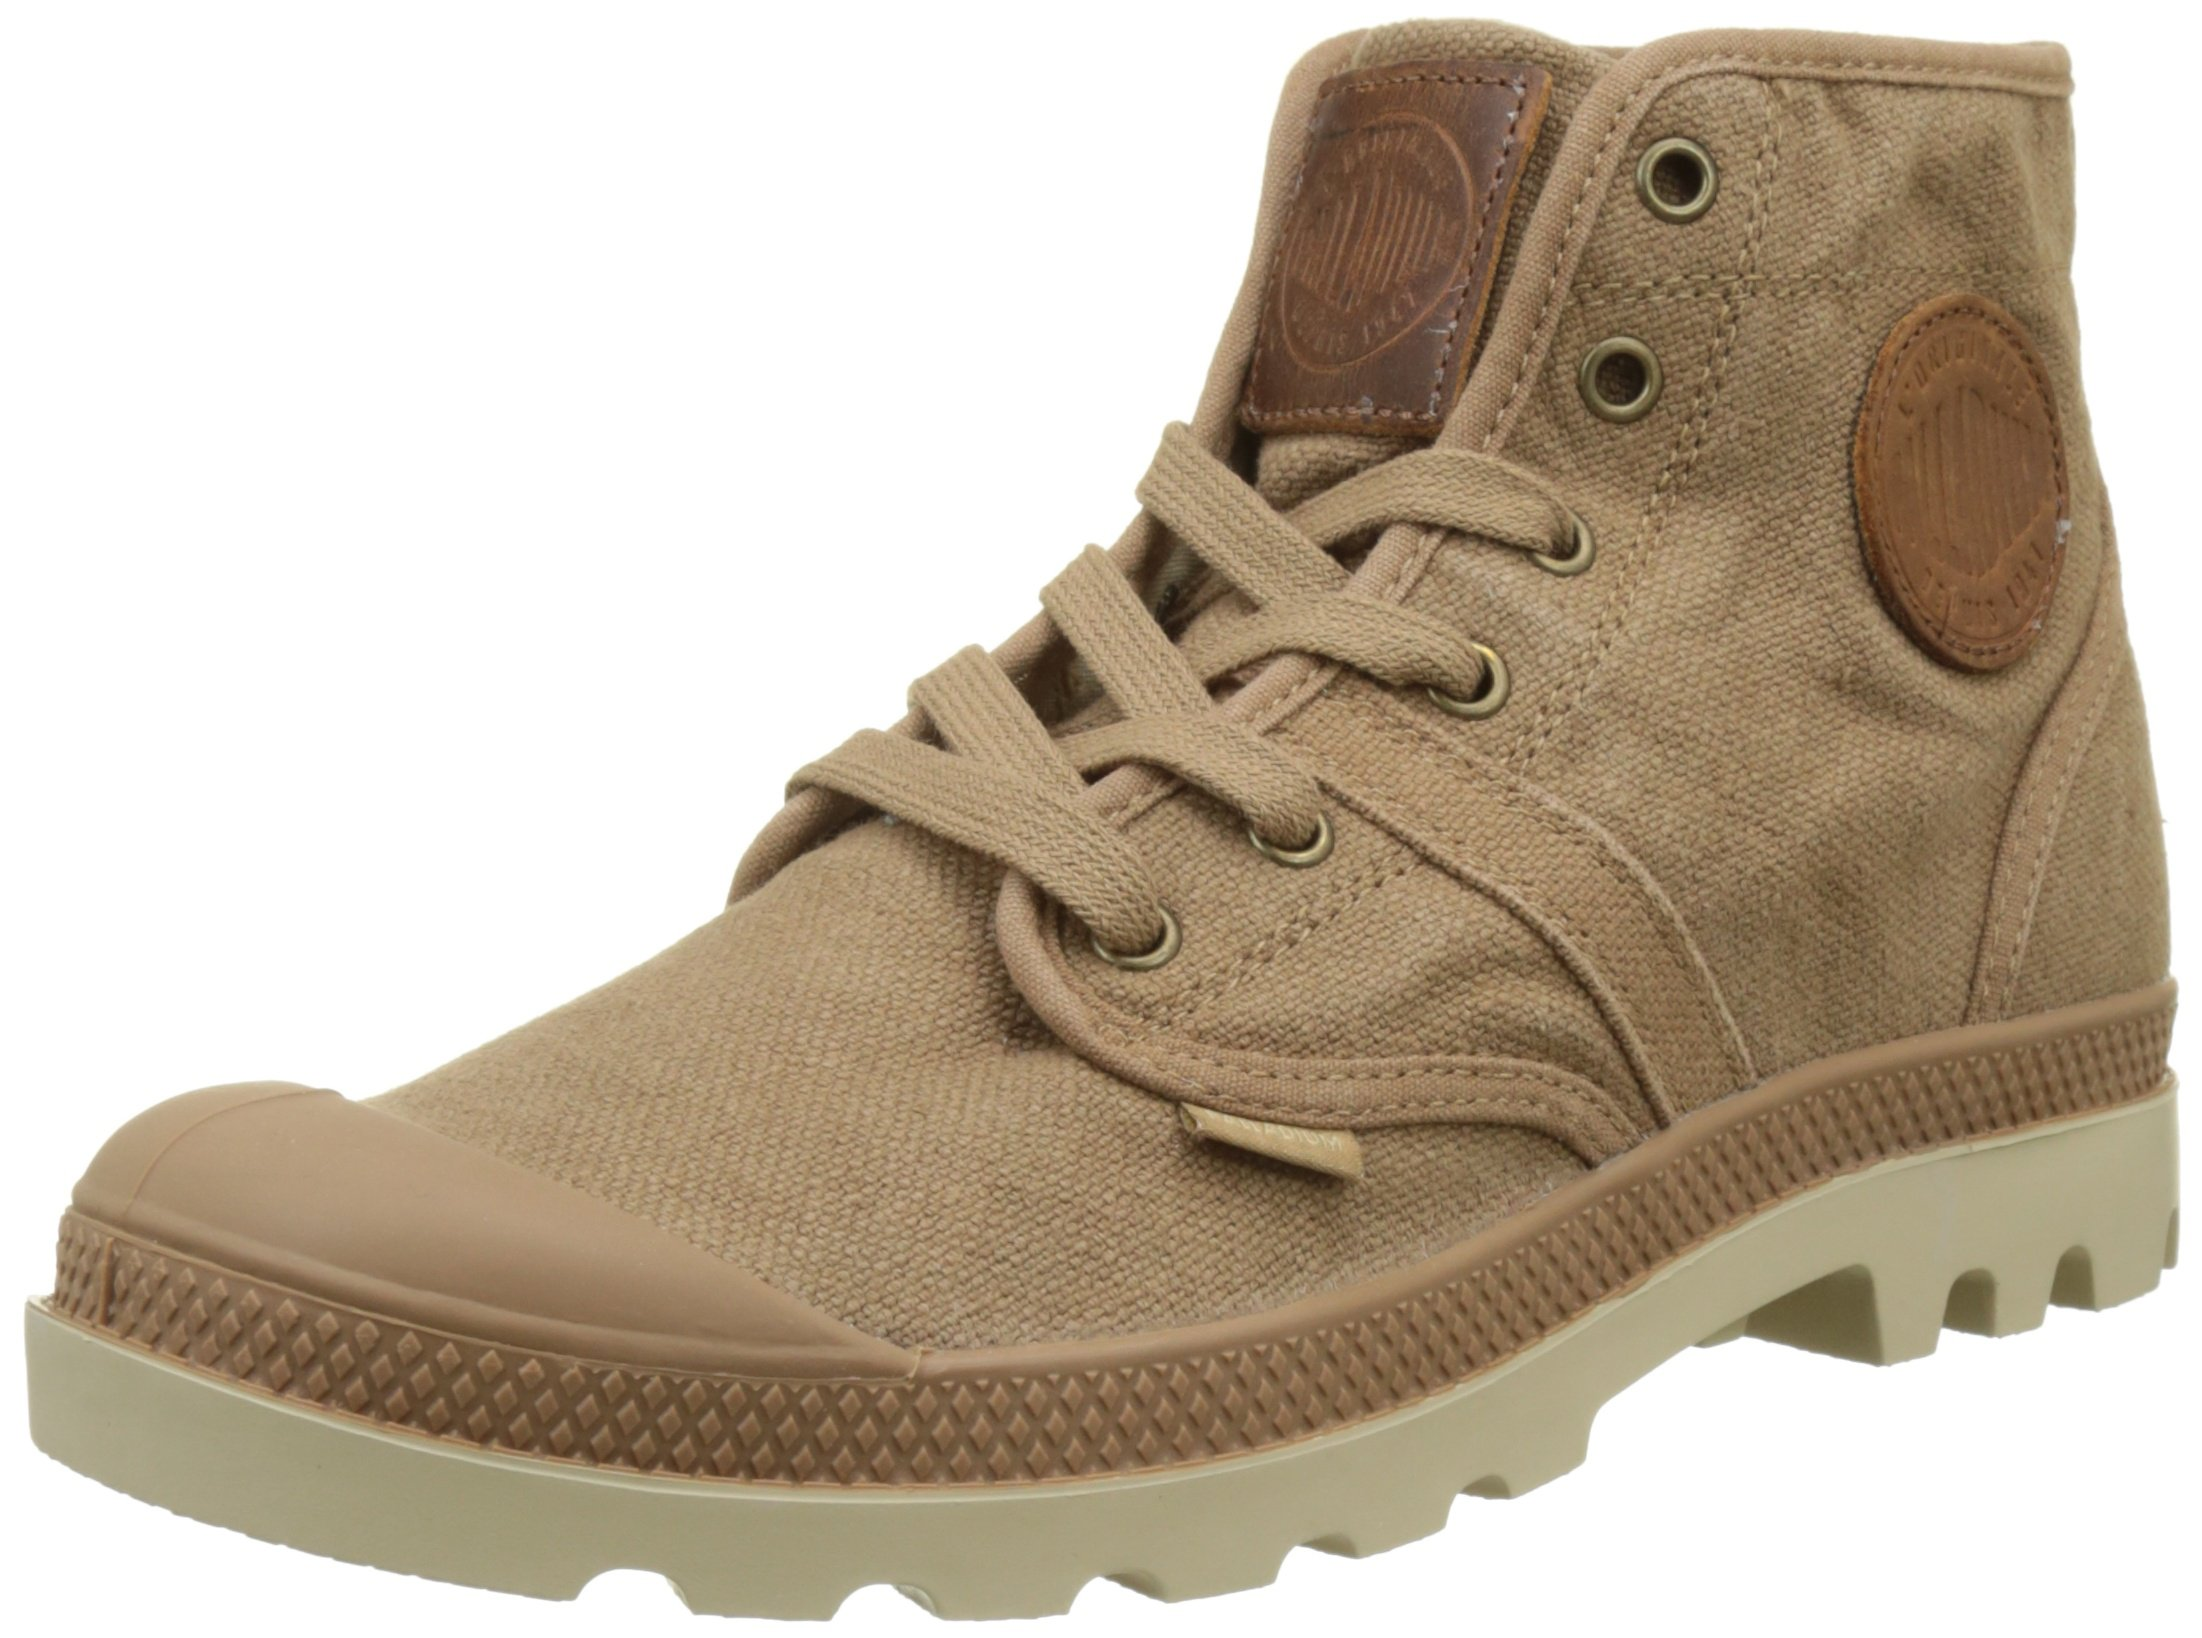 Palladium Men's Pallabrouse LC Boots, Brown, 12 US